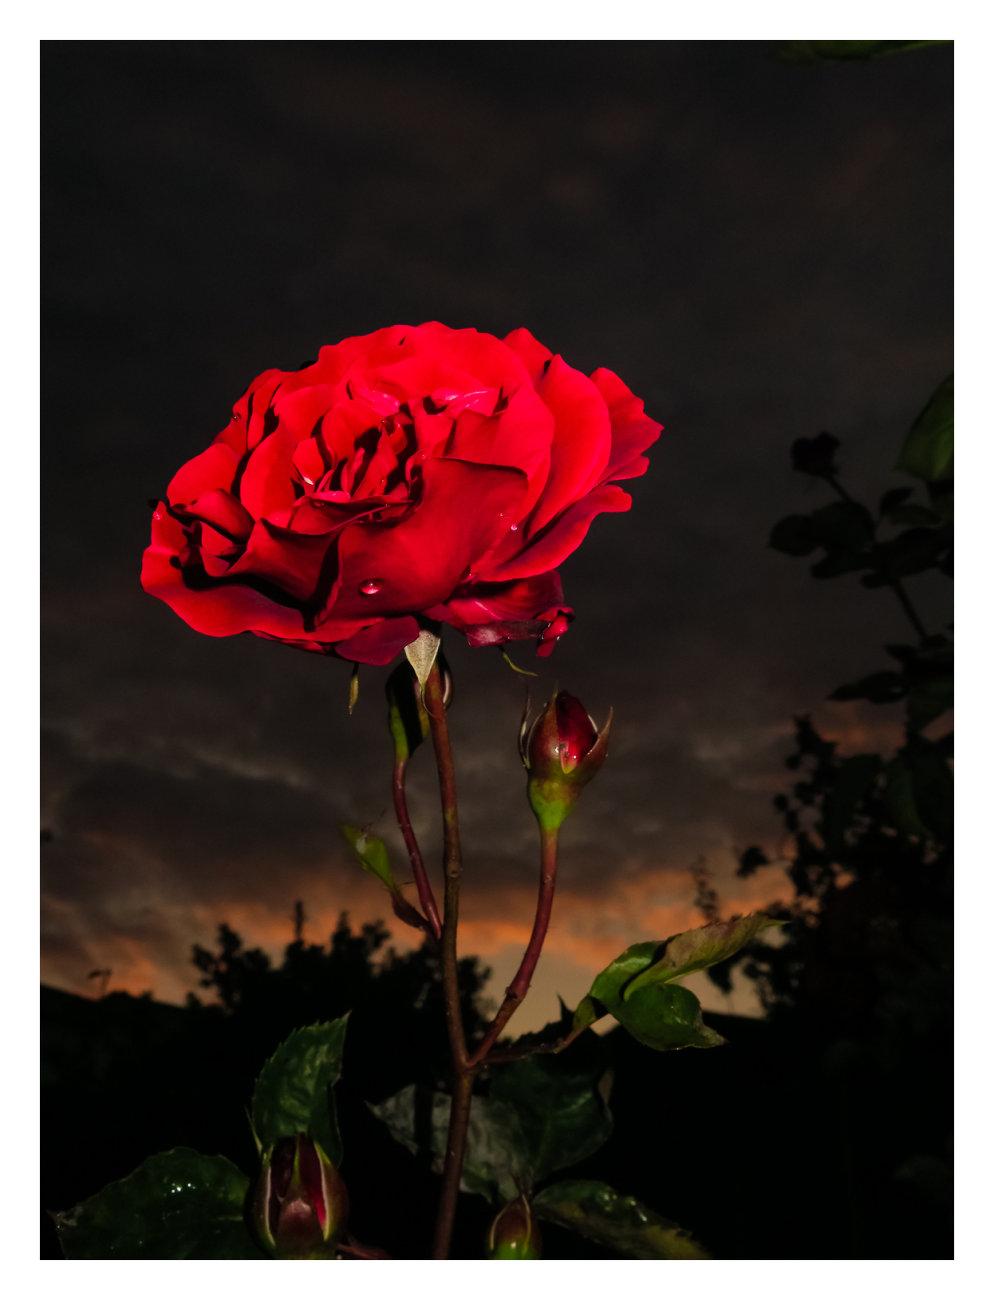 Spring rose update